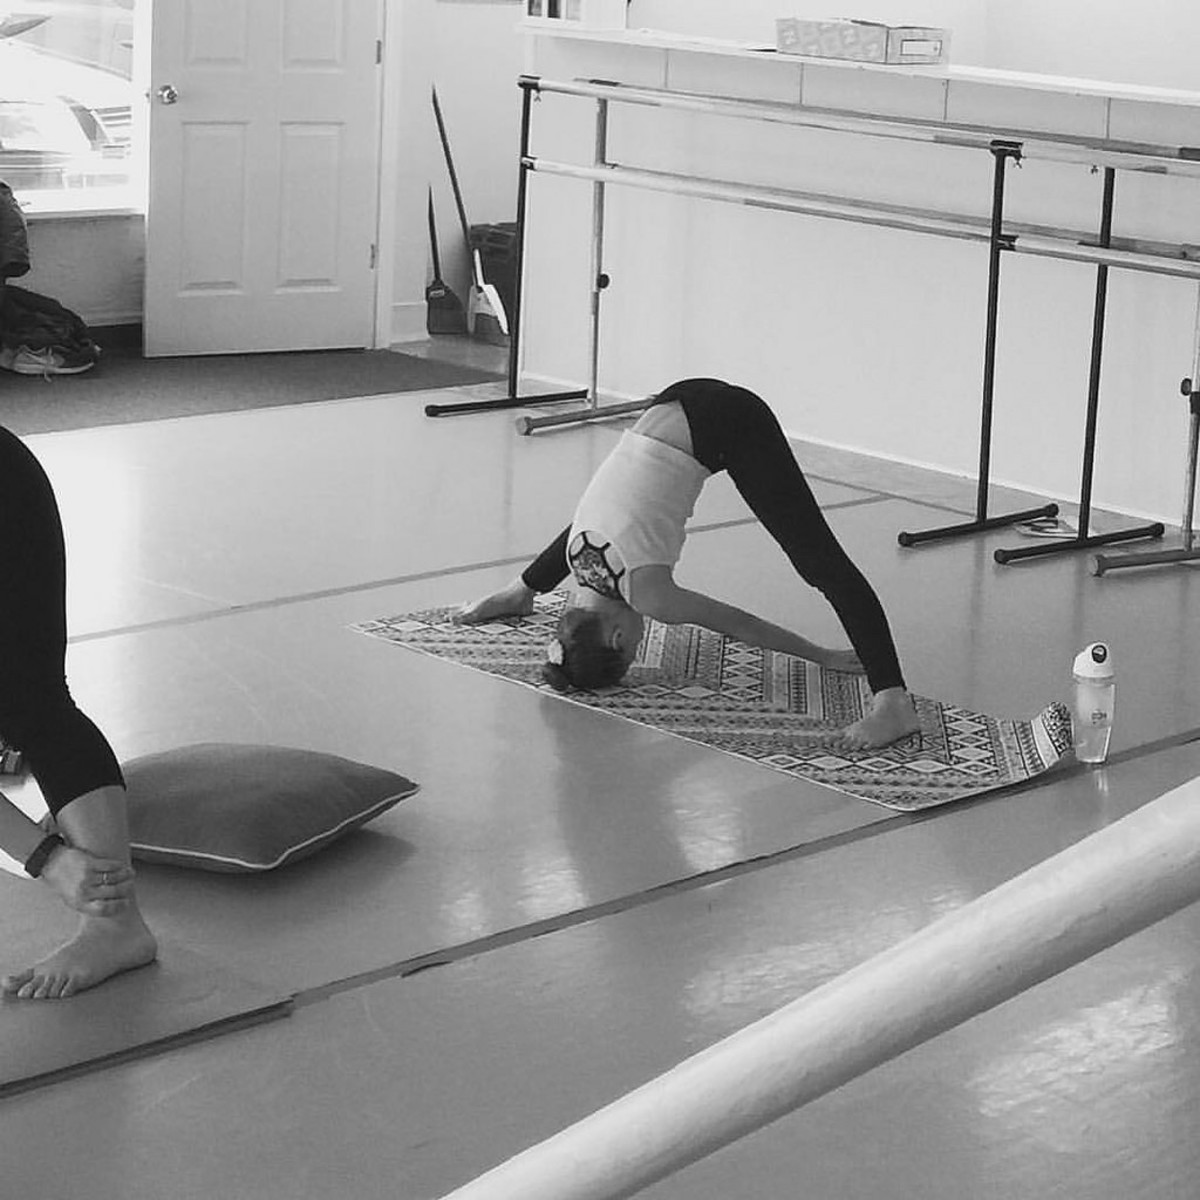 Yoga has many health benefits for kids and adults alike!